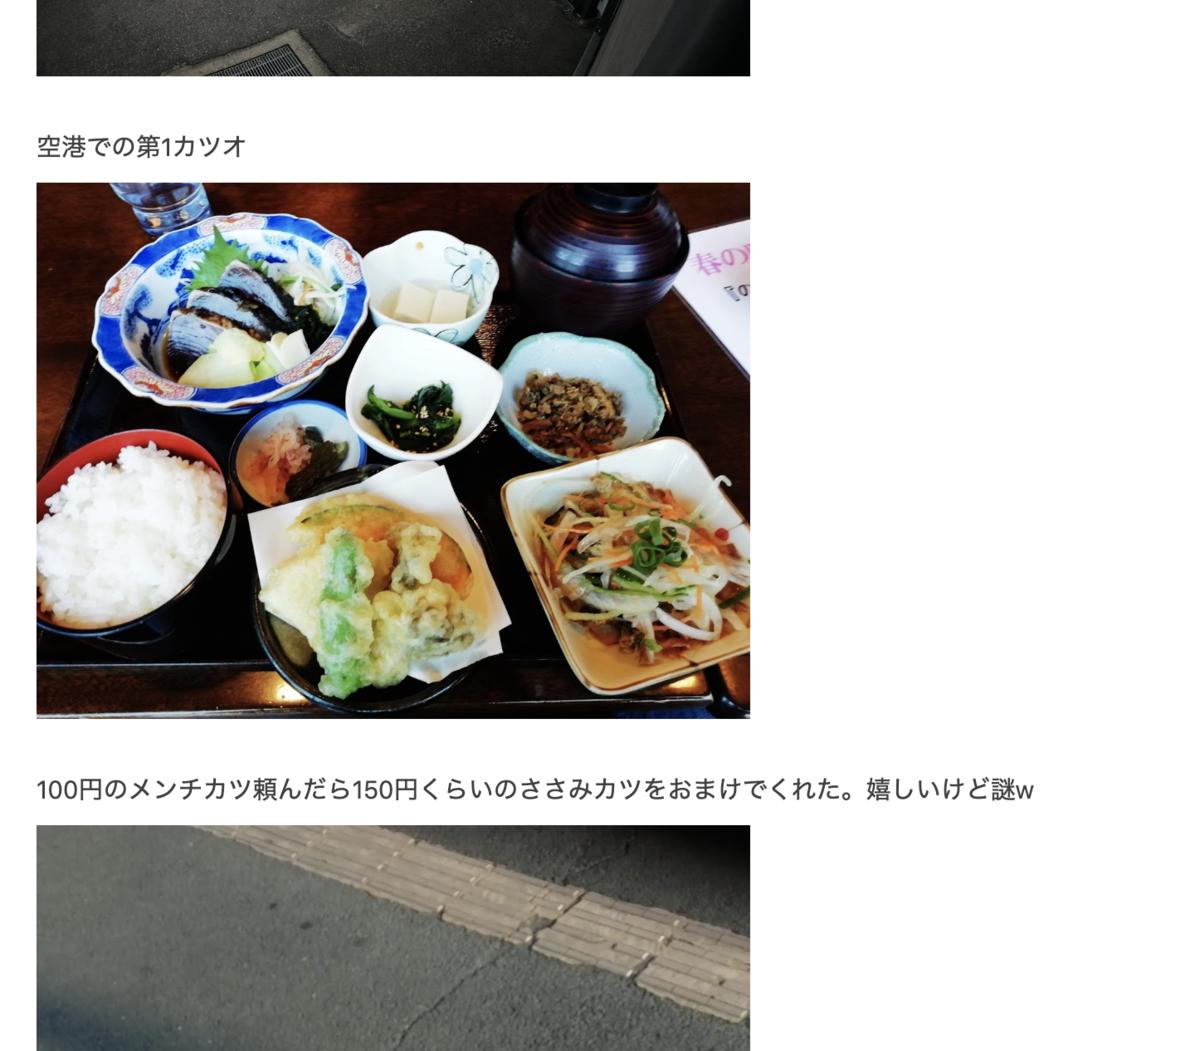 f:id:moyashidaisuke:20190910003804p:plain